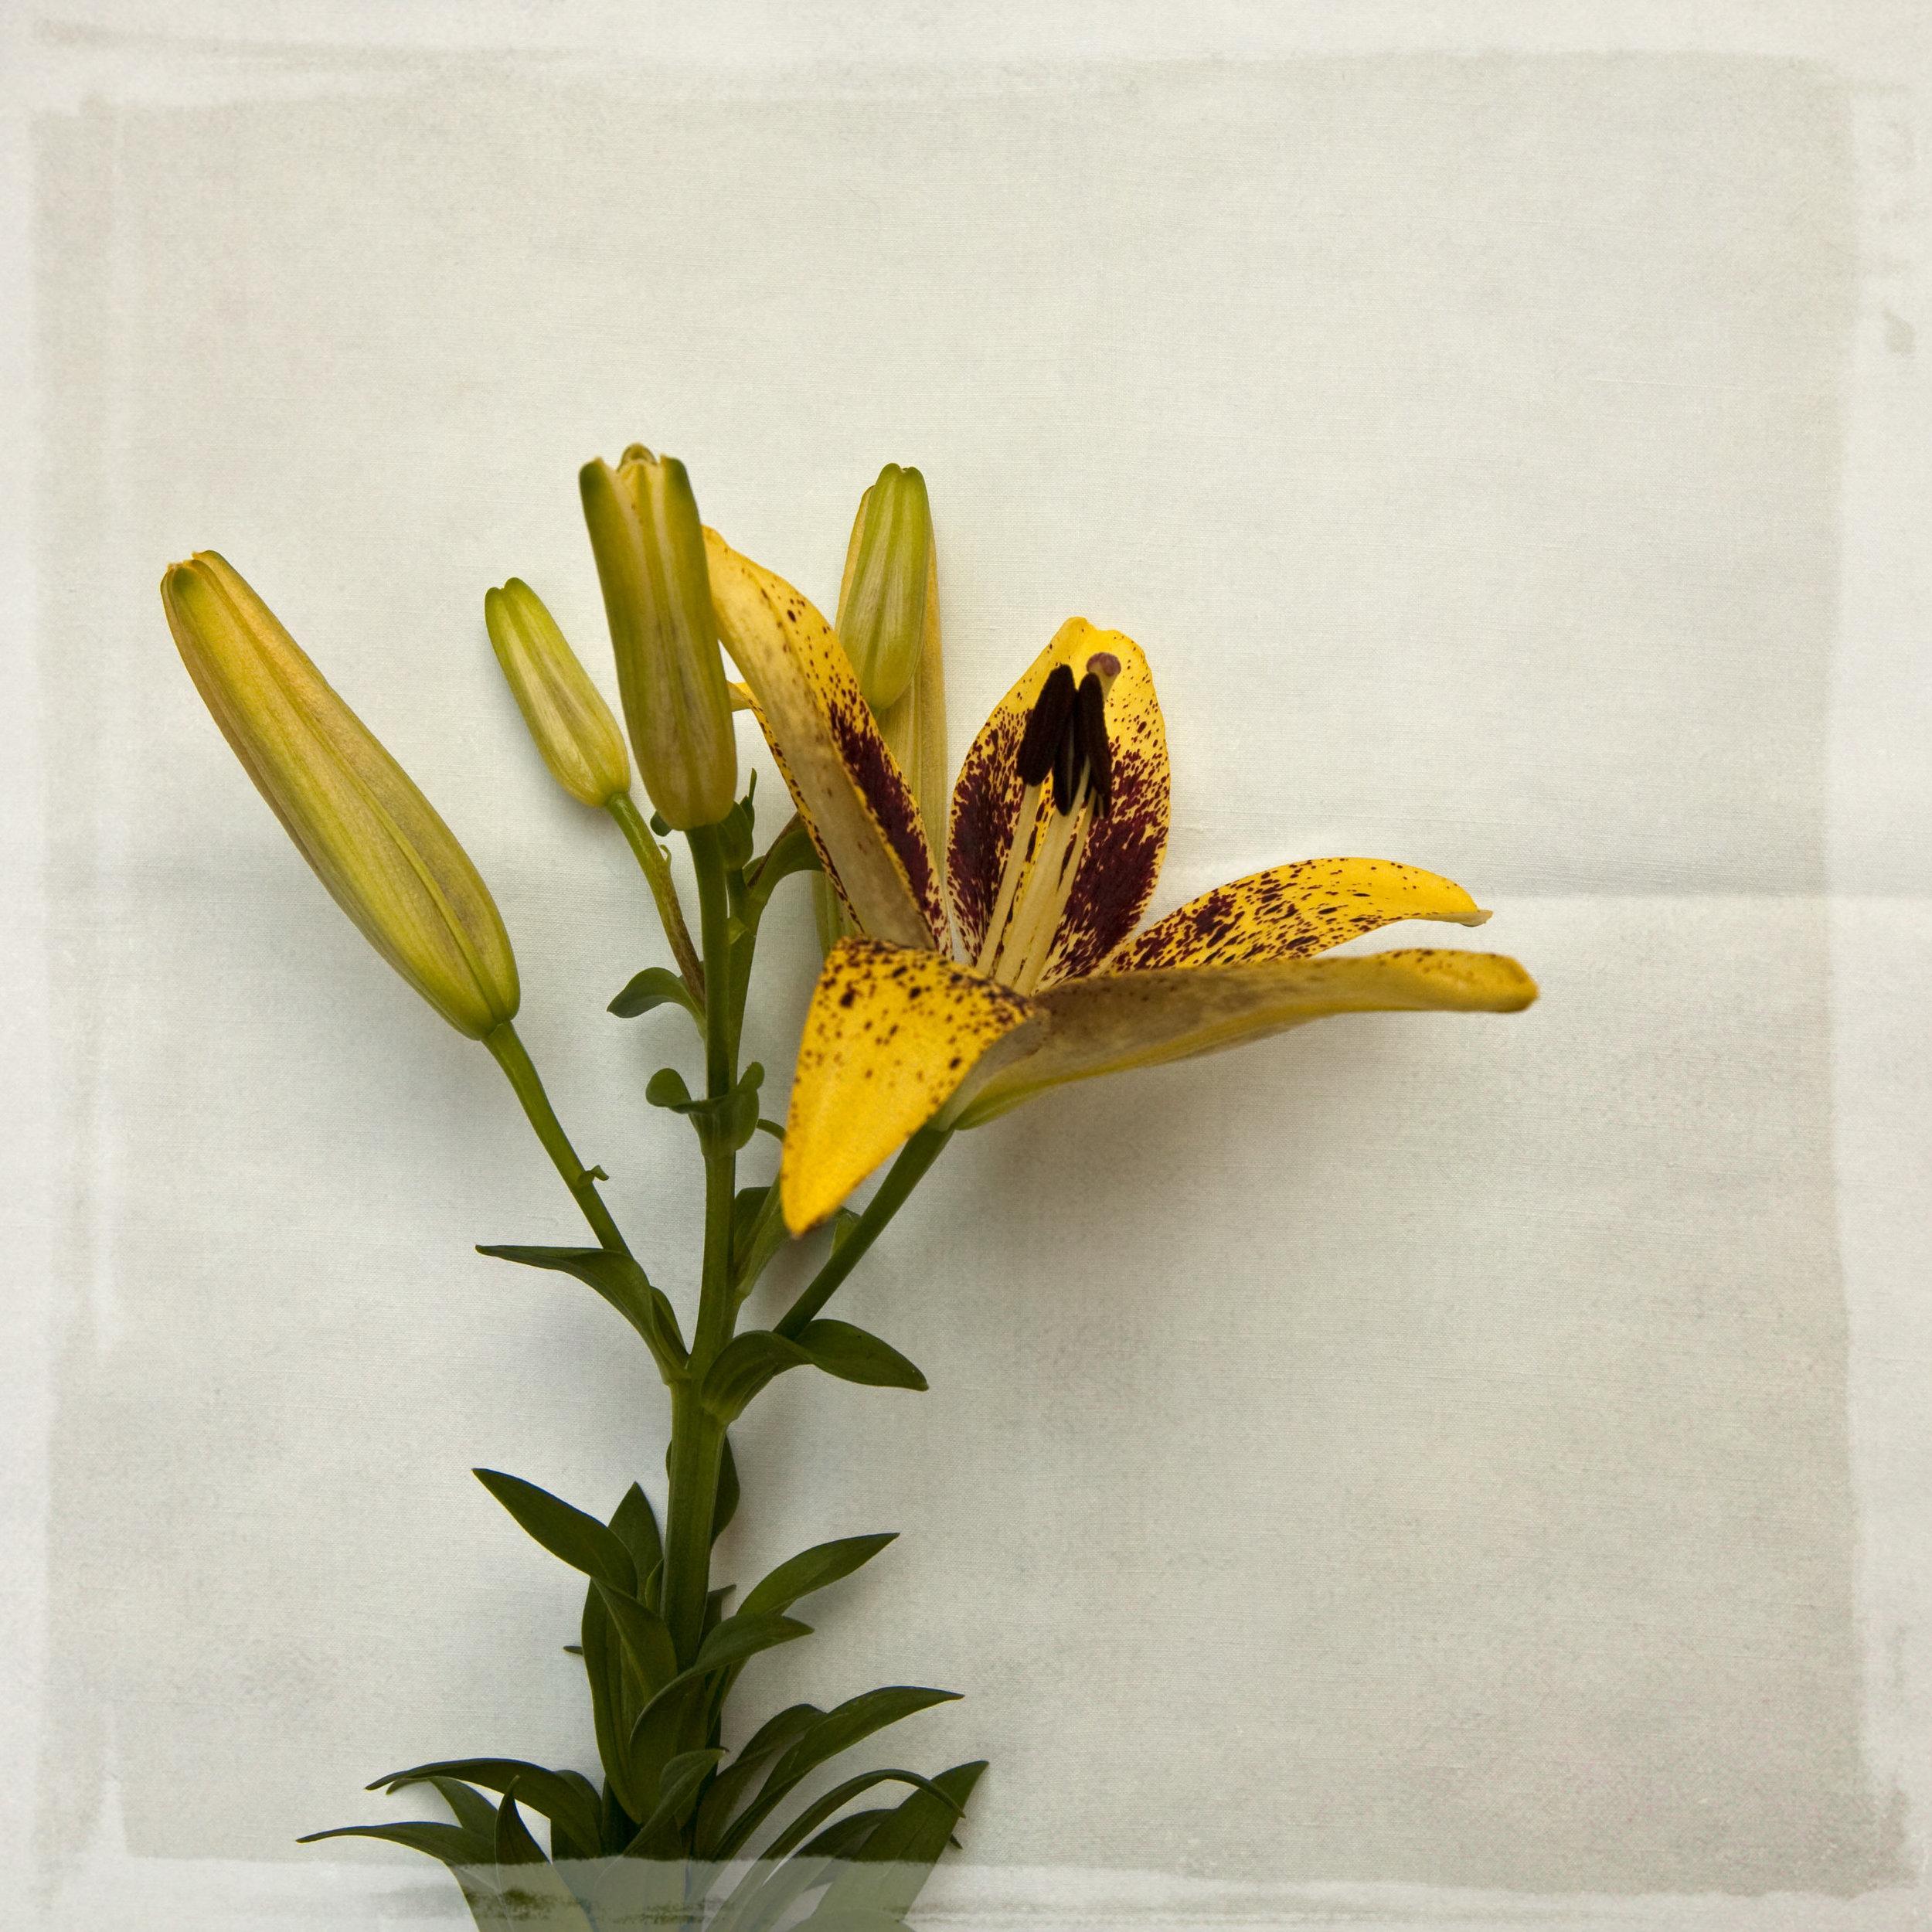 lily-7794.jpg